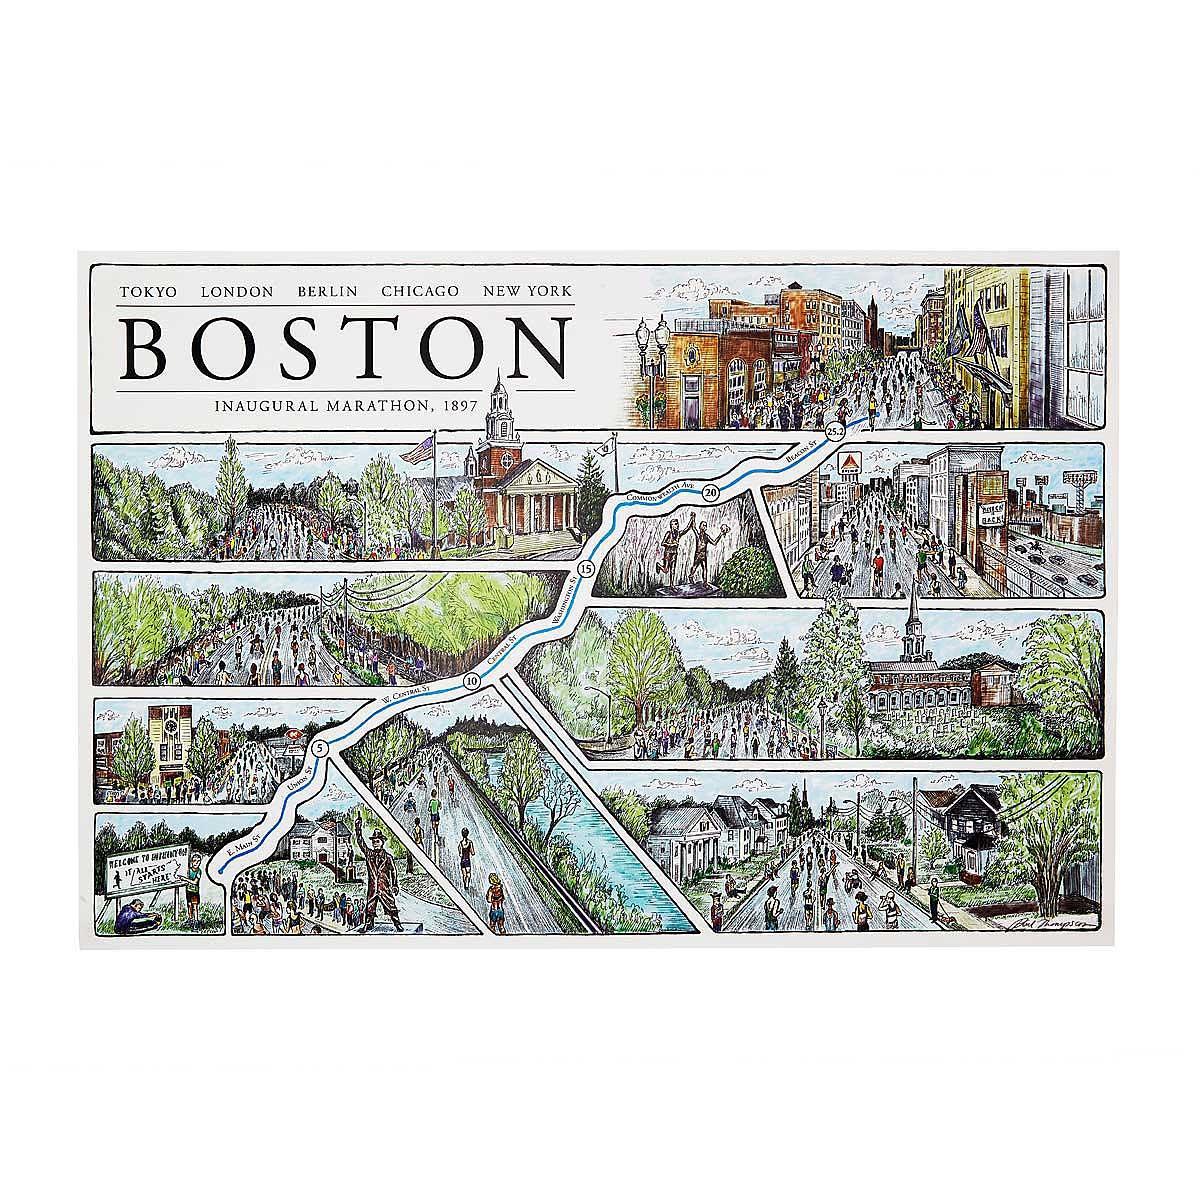 Boston Marathon Map Boston Marathon Artwork Route Map - Chicago map artwork